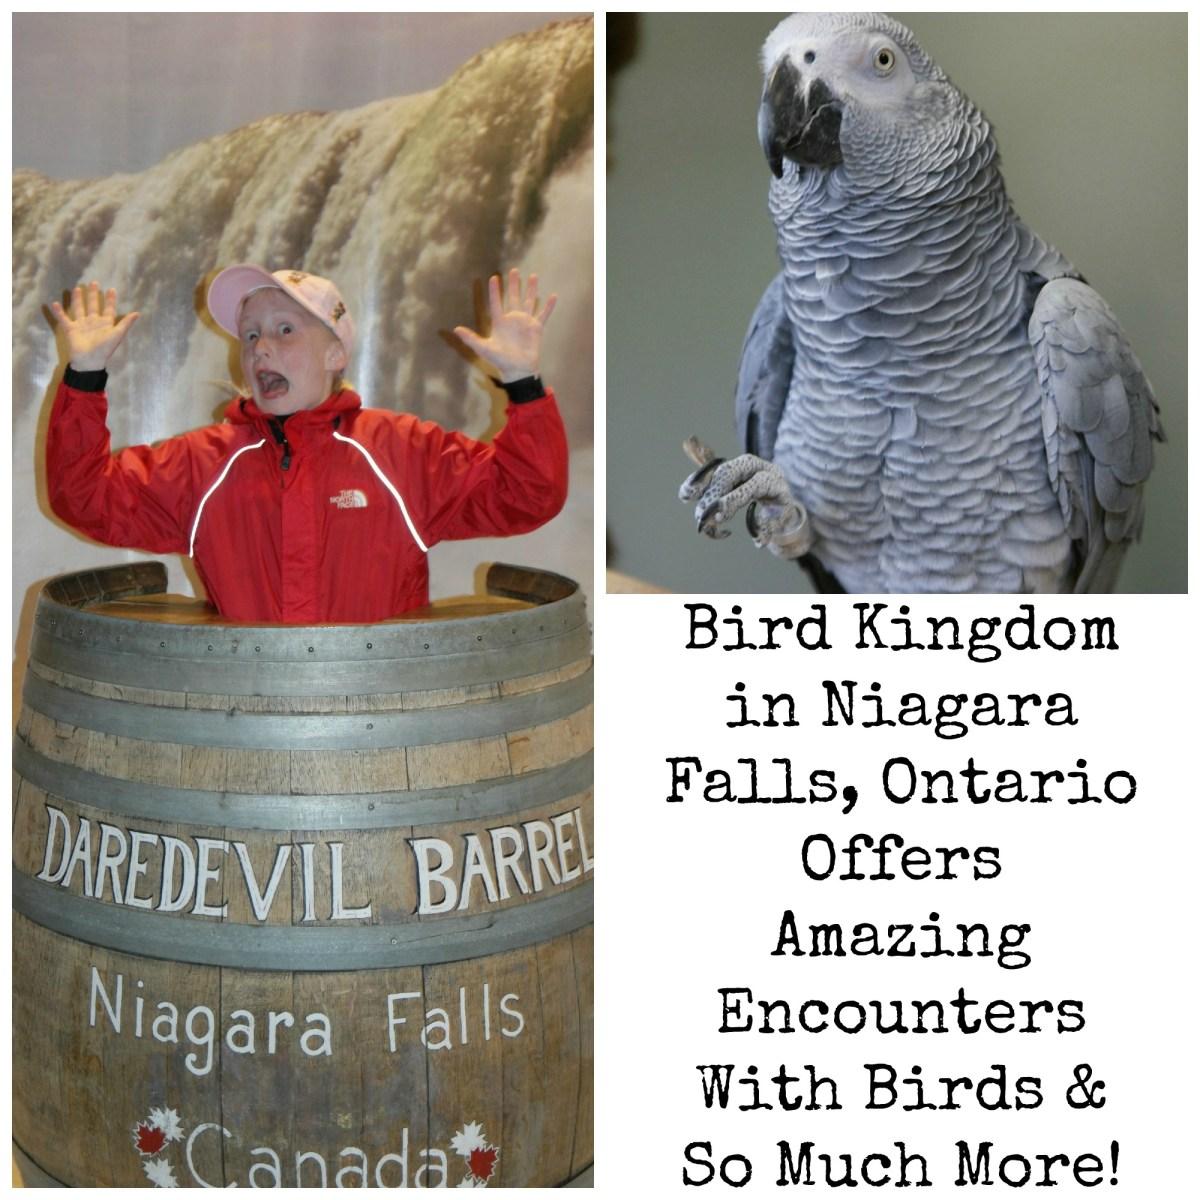 Bird Kingdom In Niagara Falls Ontario Is Amazing!